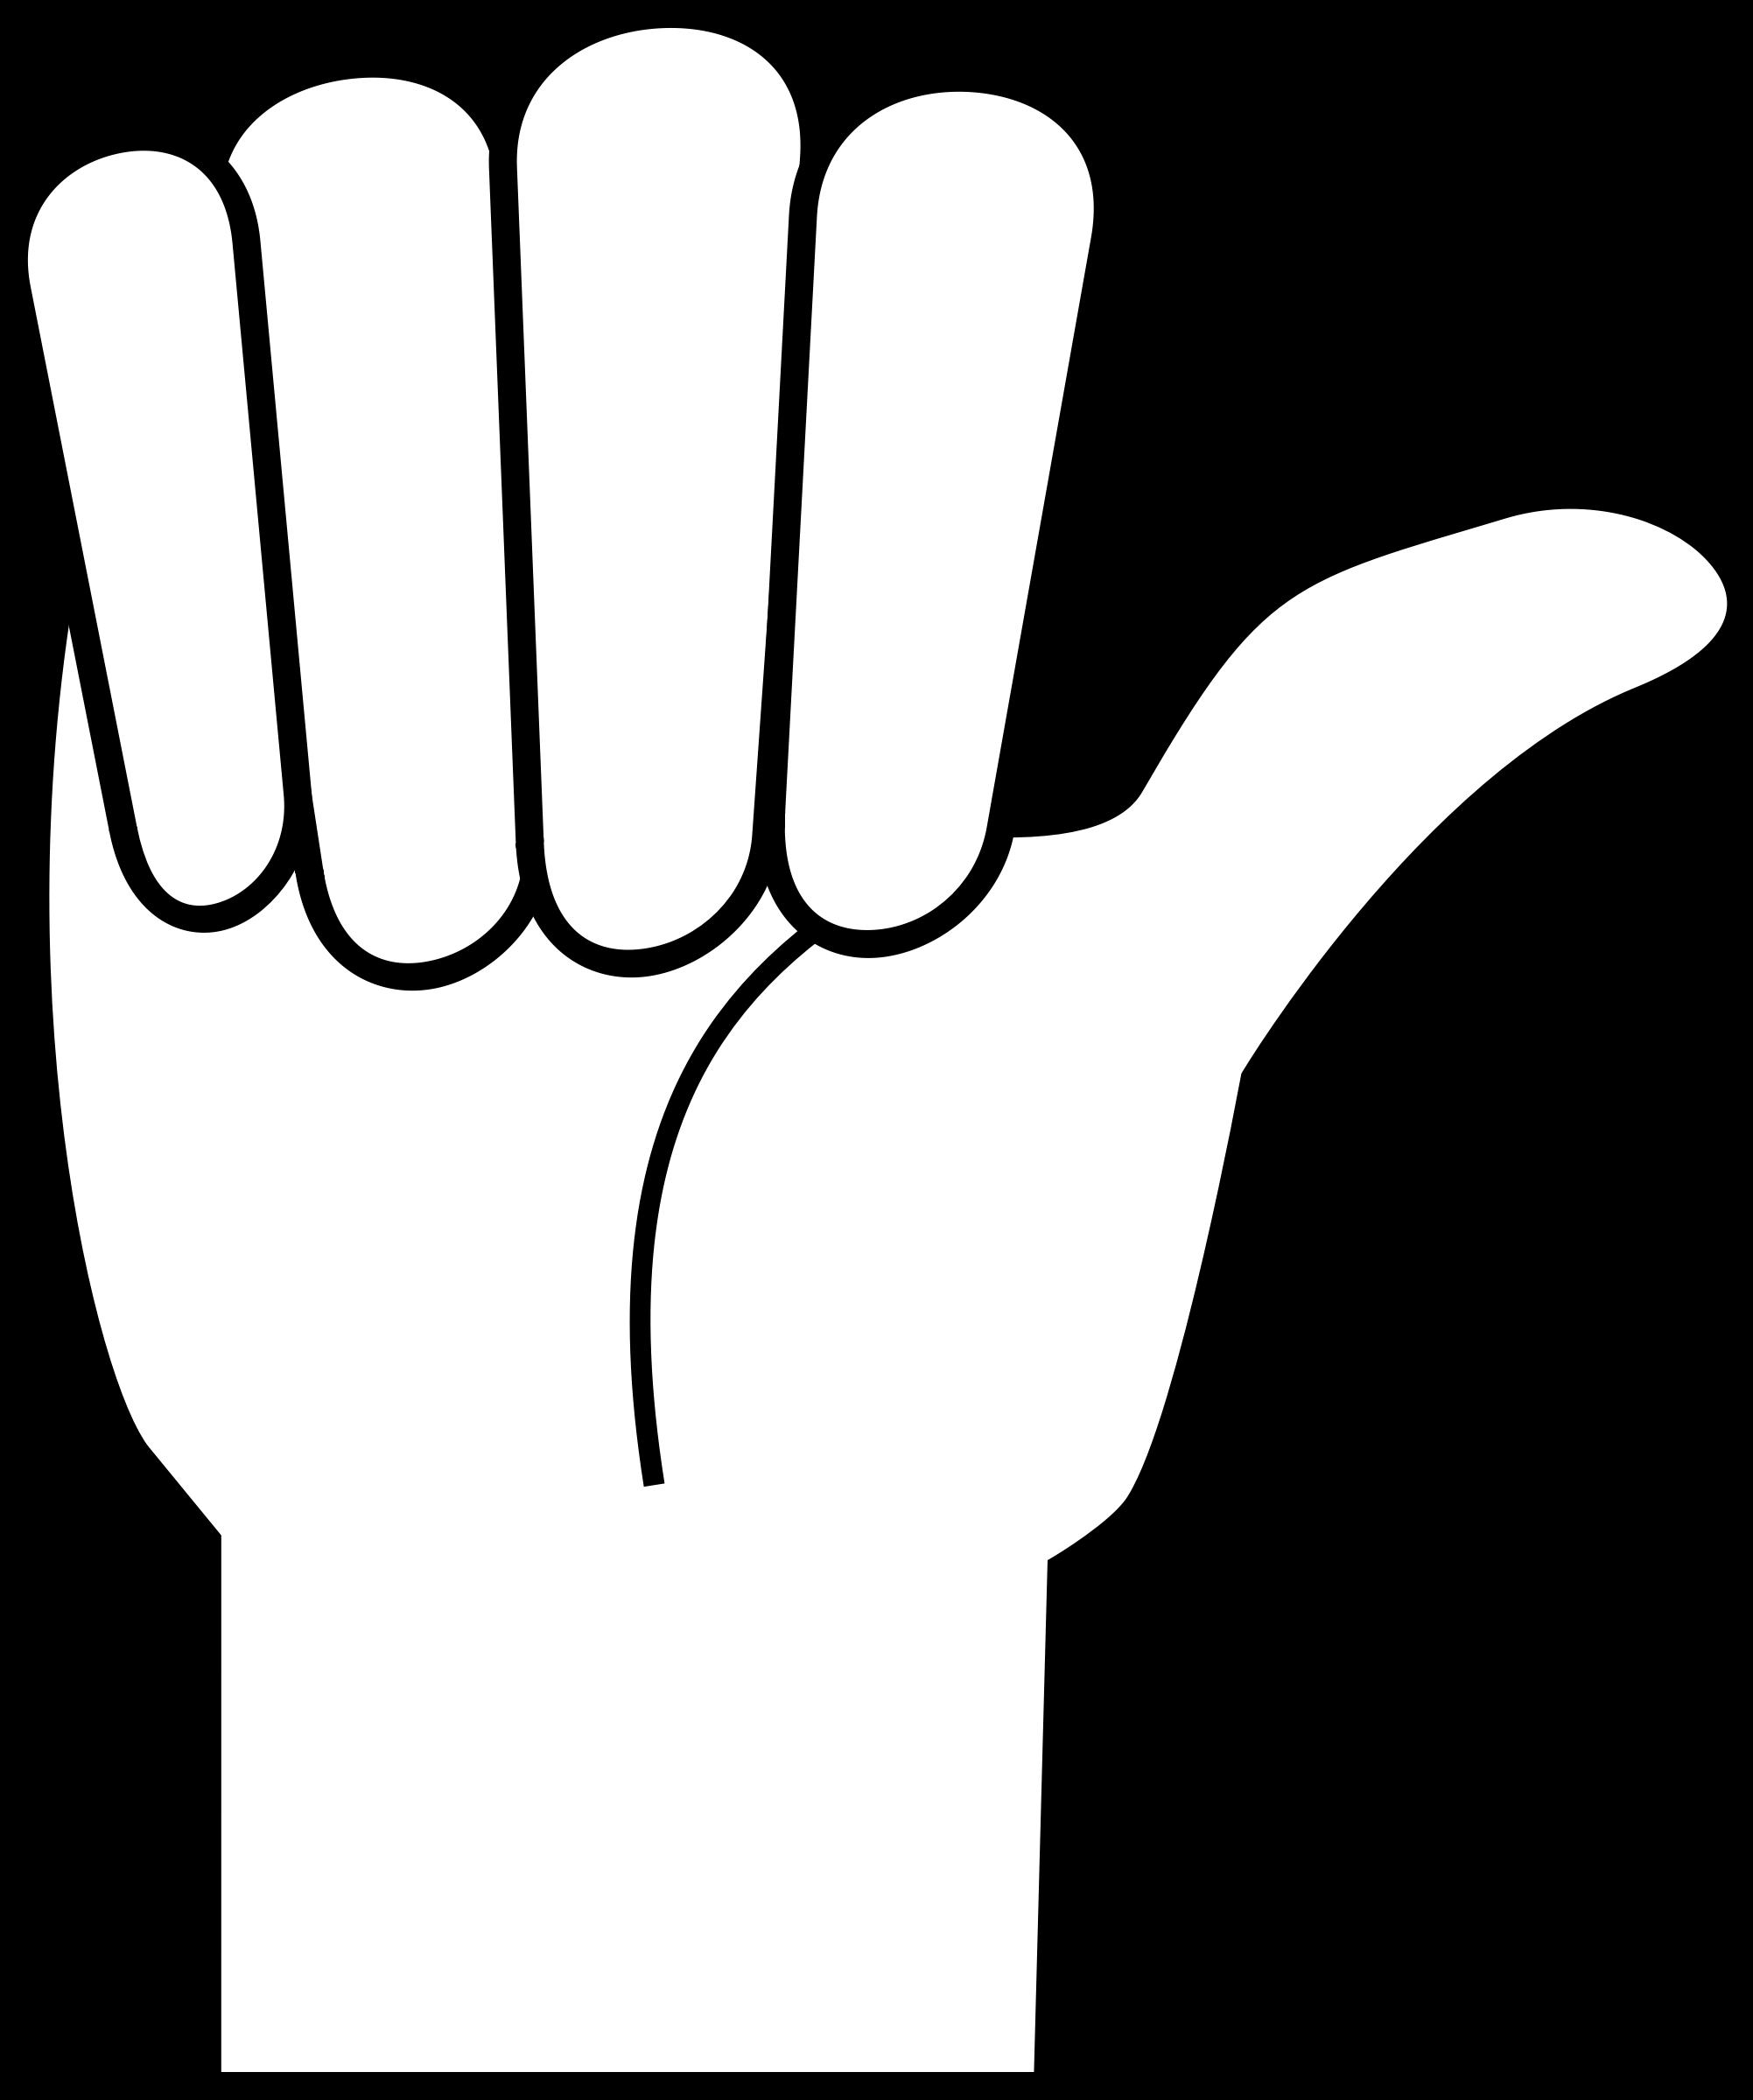 Thumb clipart hitchhiker's thumb. Hitching hand big image